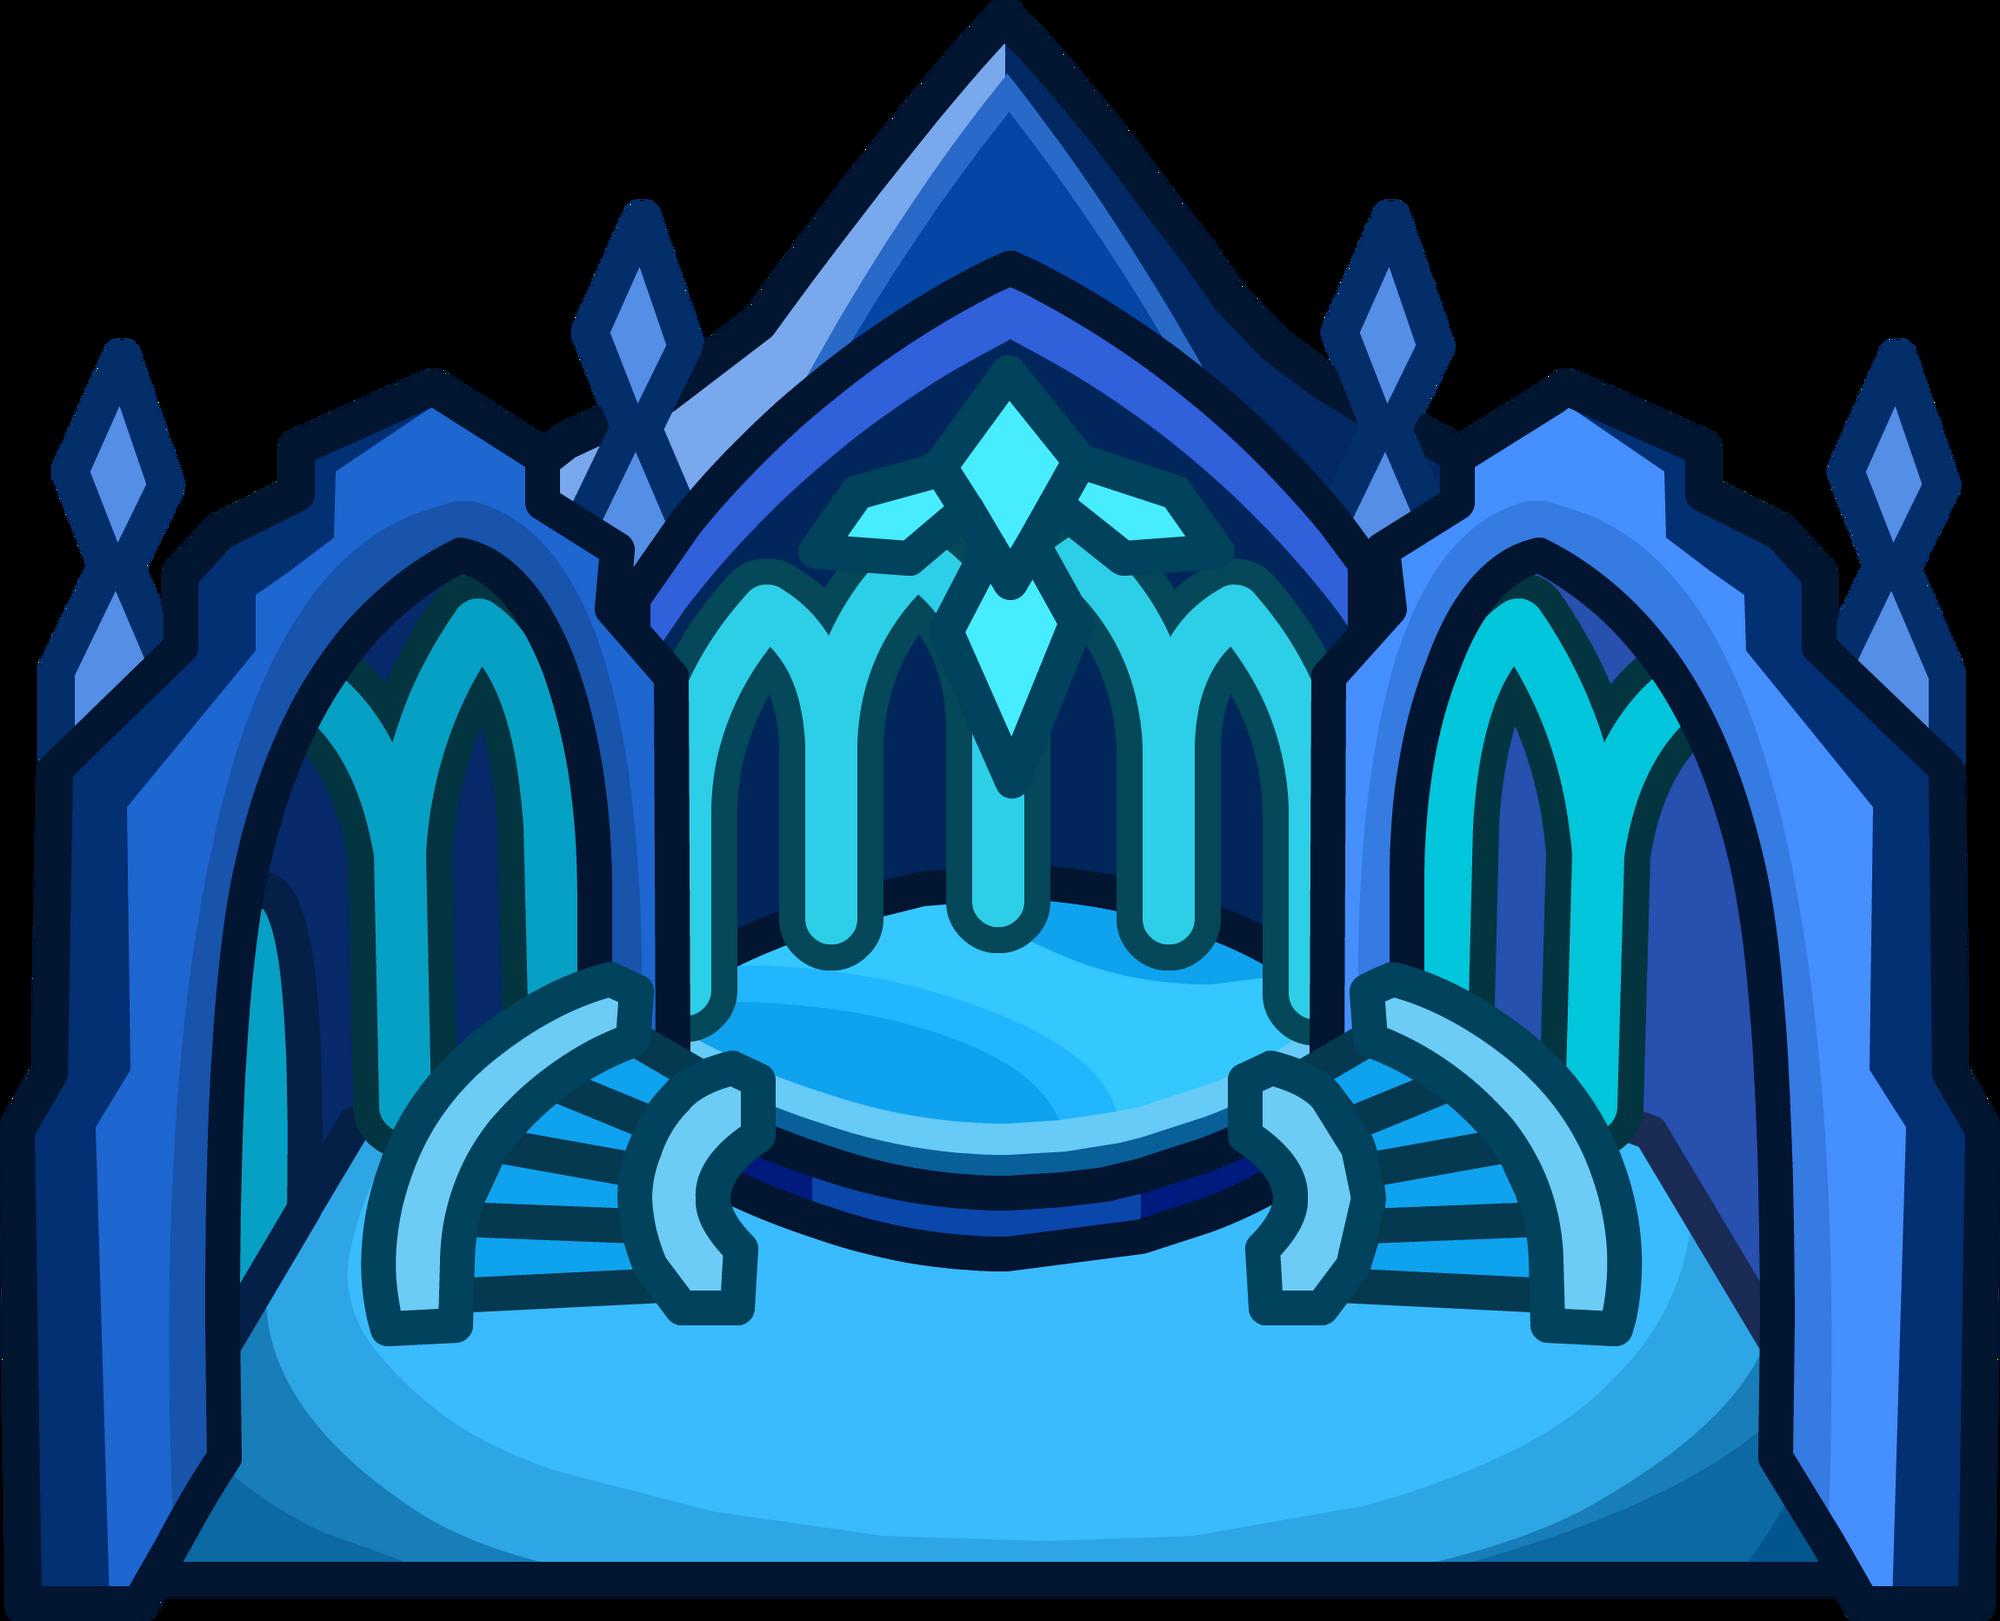 Ice Palace Igloo Club Penguin Wiki Fandom Powered By Wikia